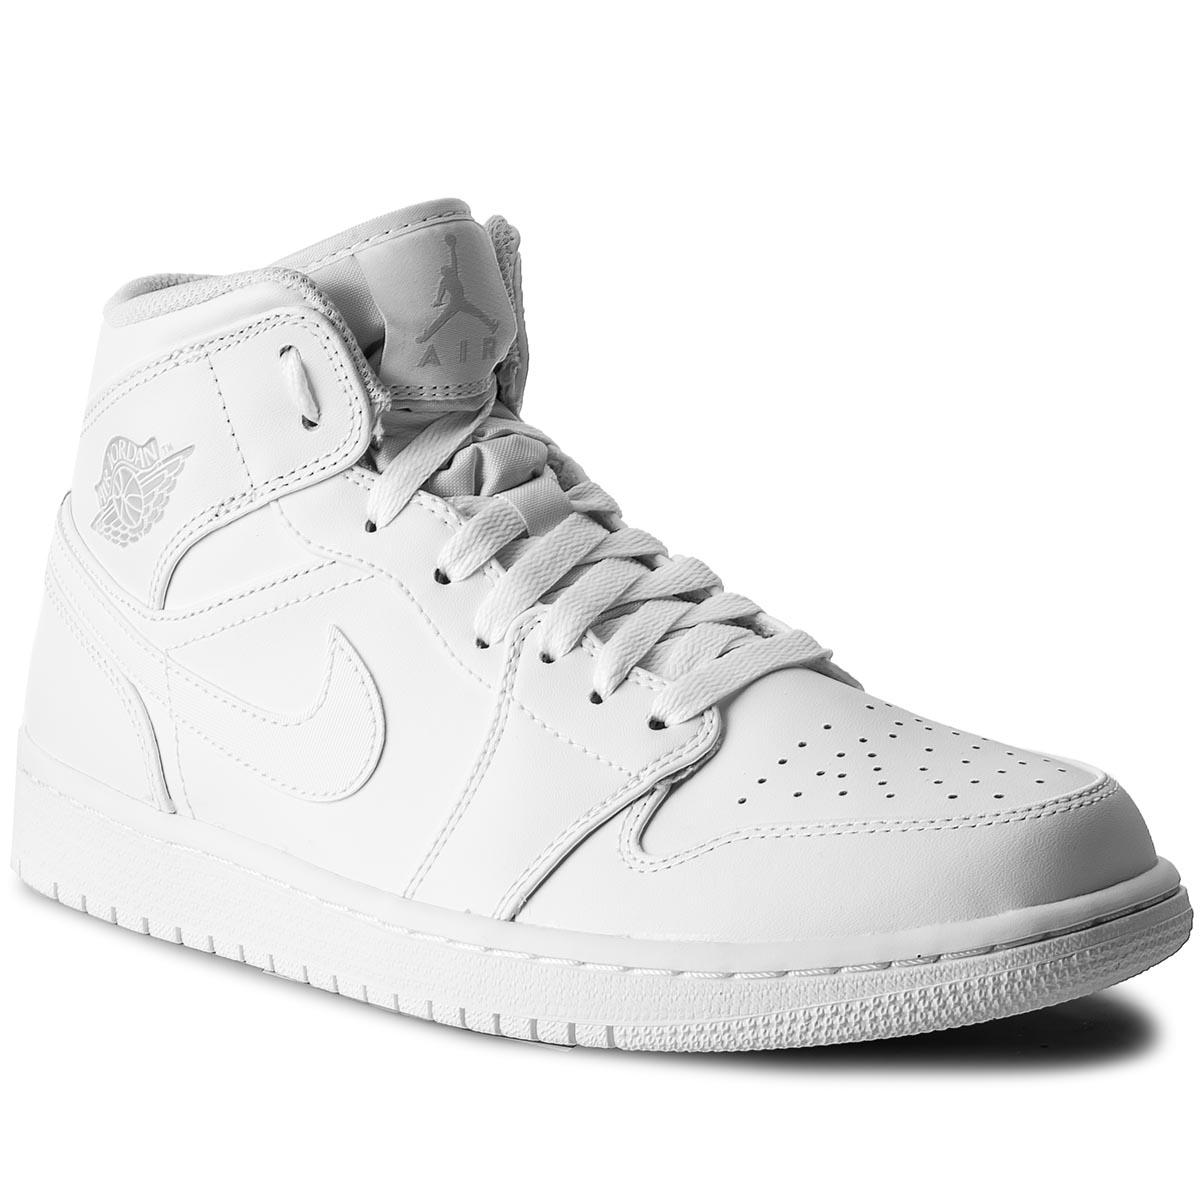 sports shoes 99bd2 300e0 Shoes NIKE Air Jordan 1 Mid 554724 104 White Pure Platinum White